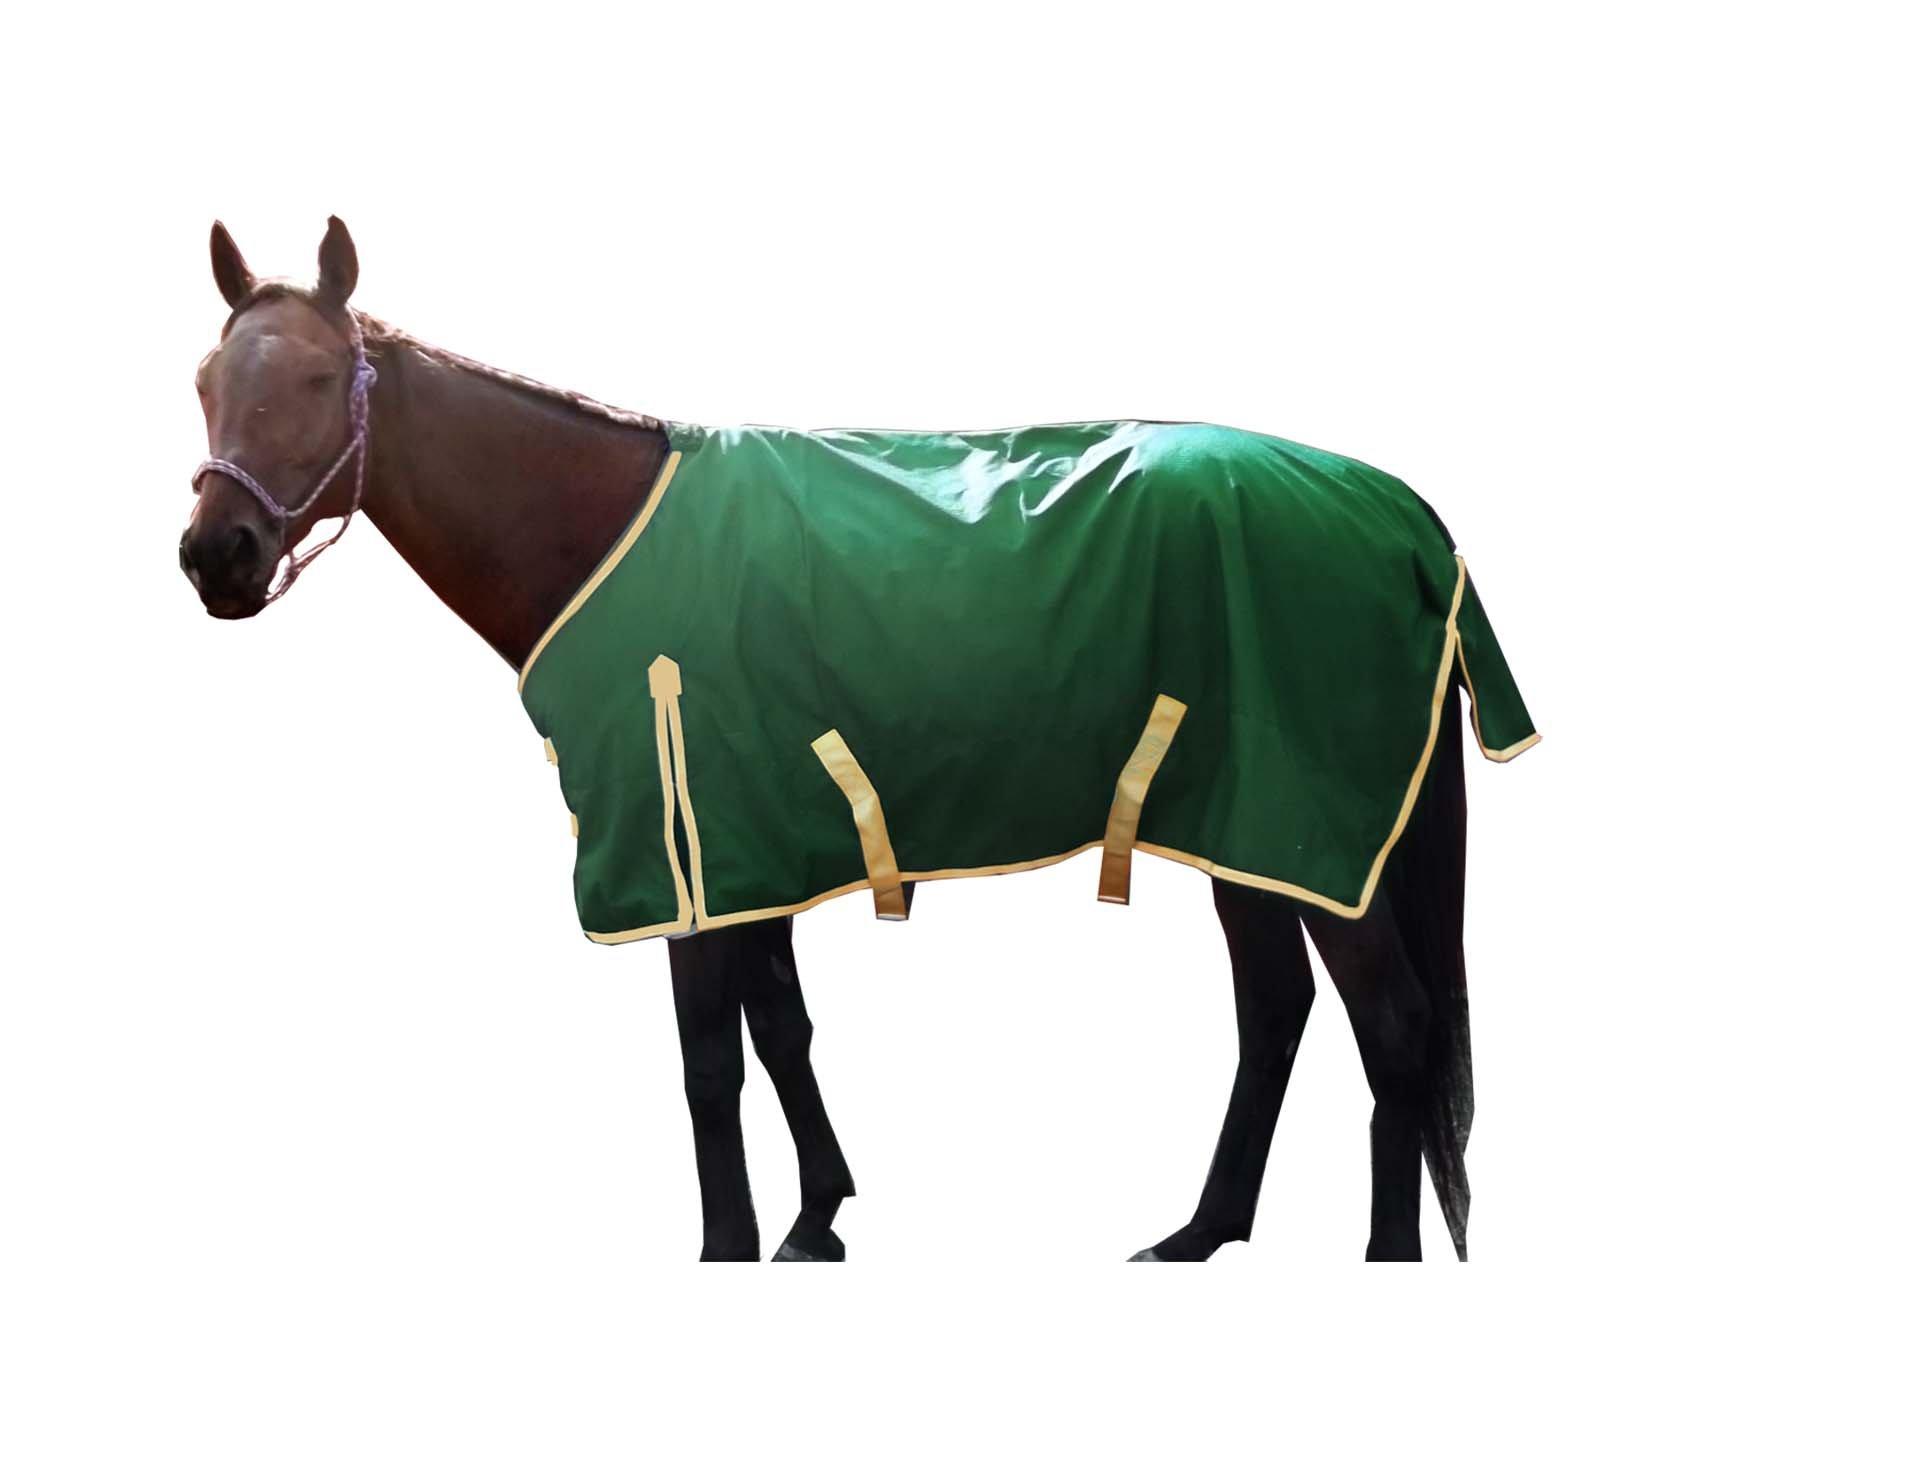 Derby Originals Deluxe Series 600D Ripstop Waterproof Medium Weight Winter Turnout Horse Blanket by Derby Originals (Image #2)